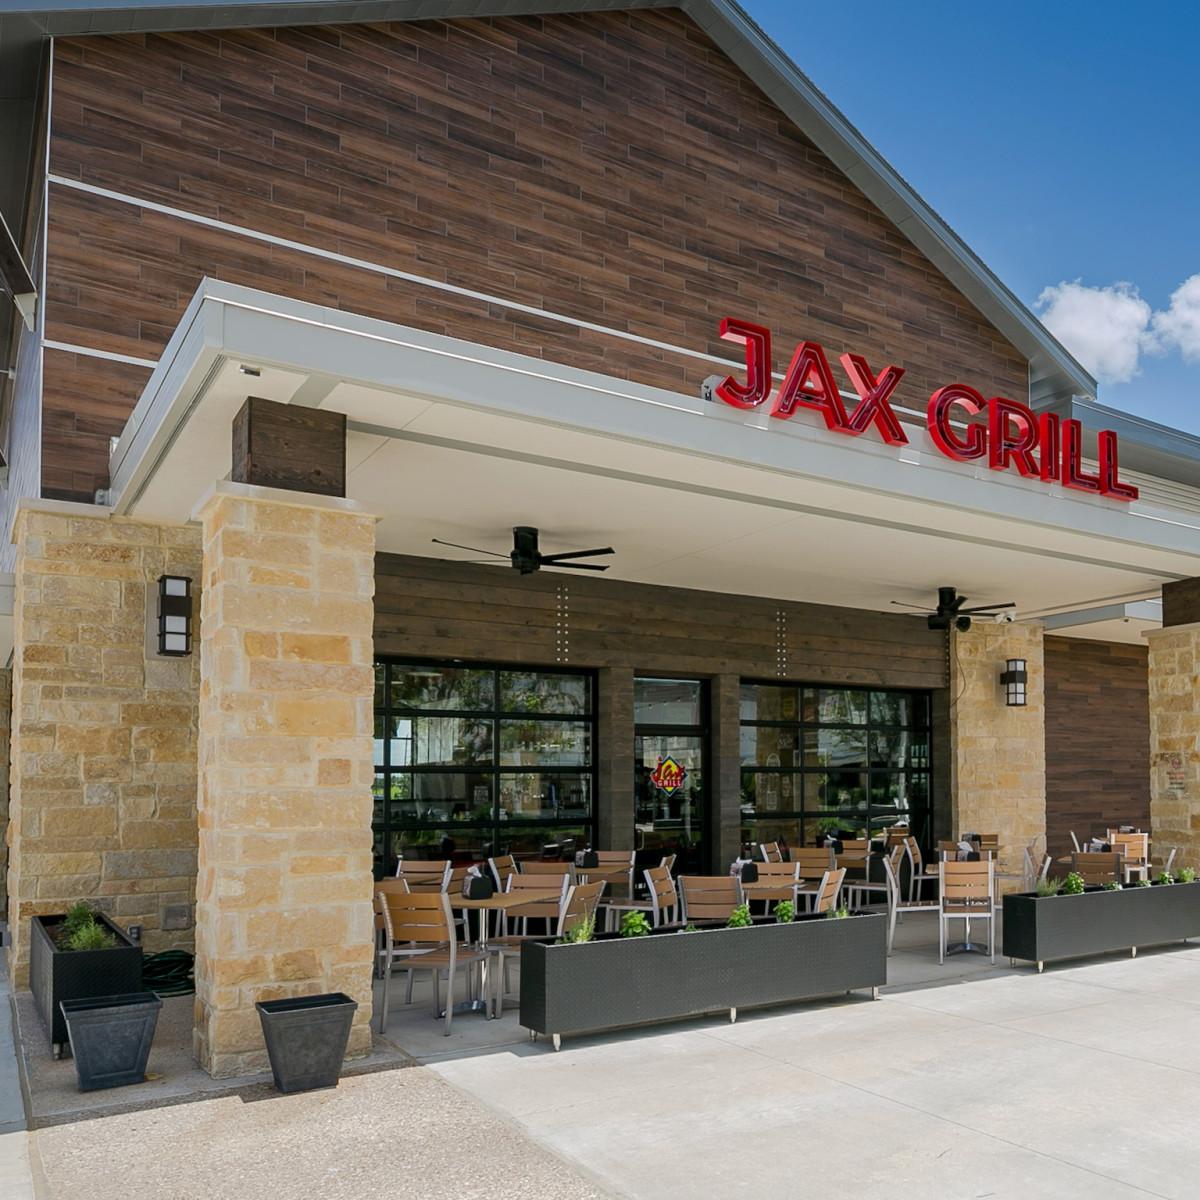 Jax Grill Katy exterior